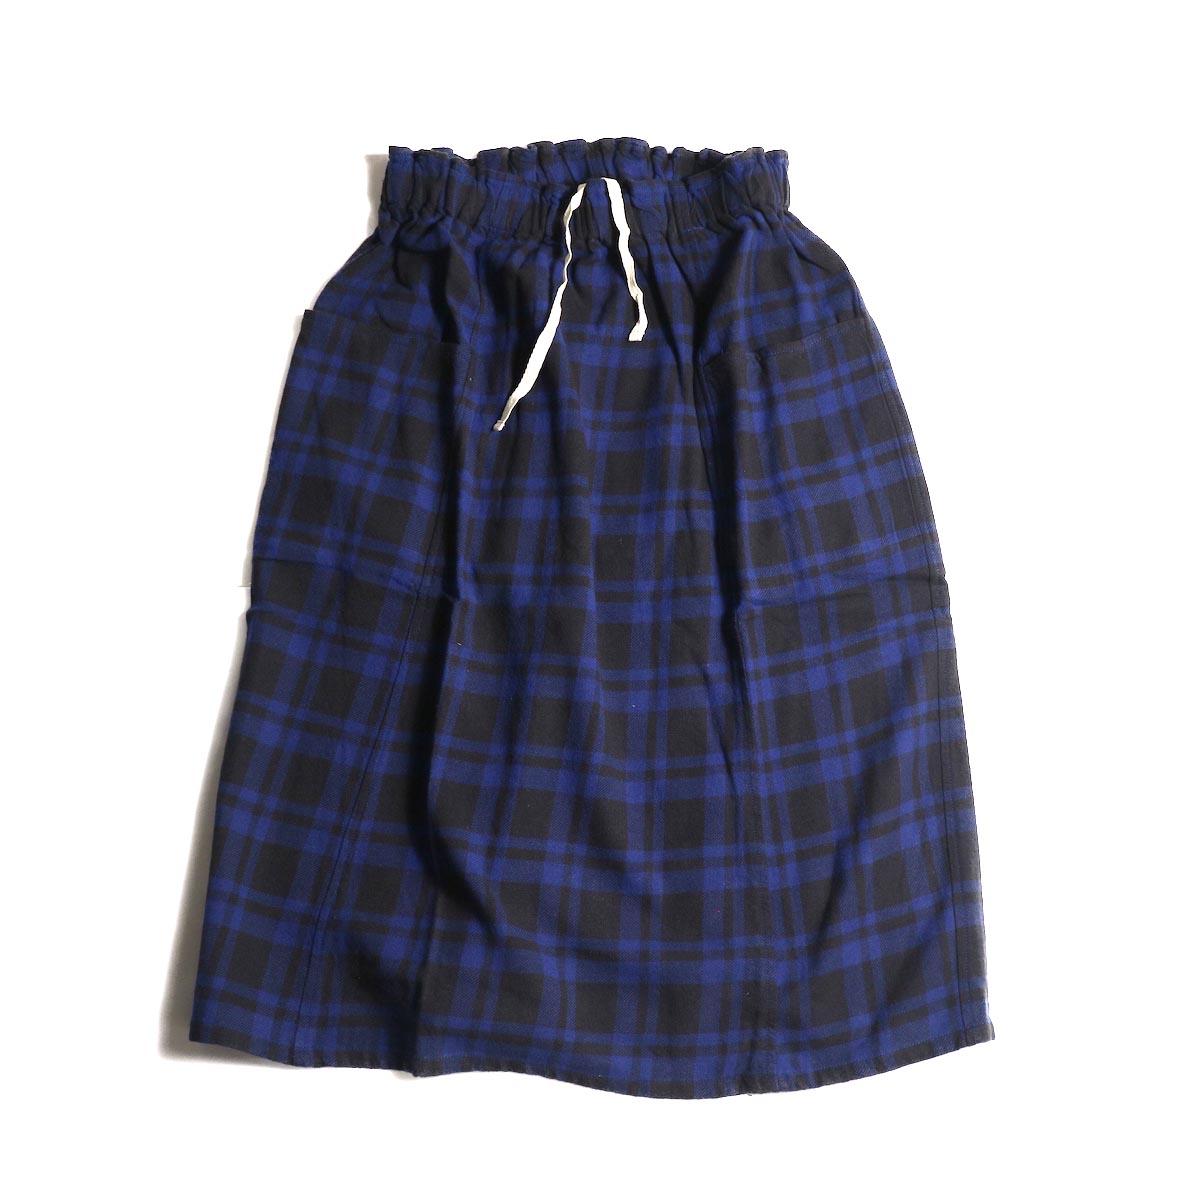 SOUTH2 WEST8 / Army String Skirt -Plaid Twill (Blue/Black)